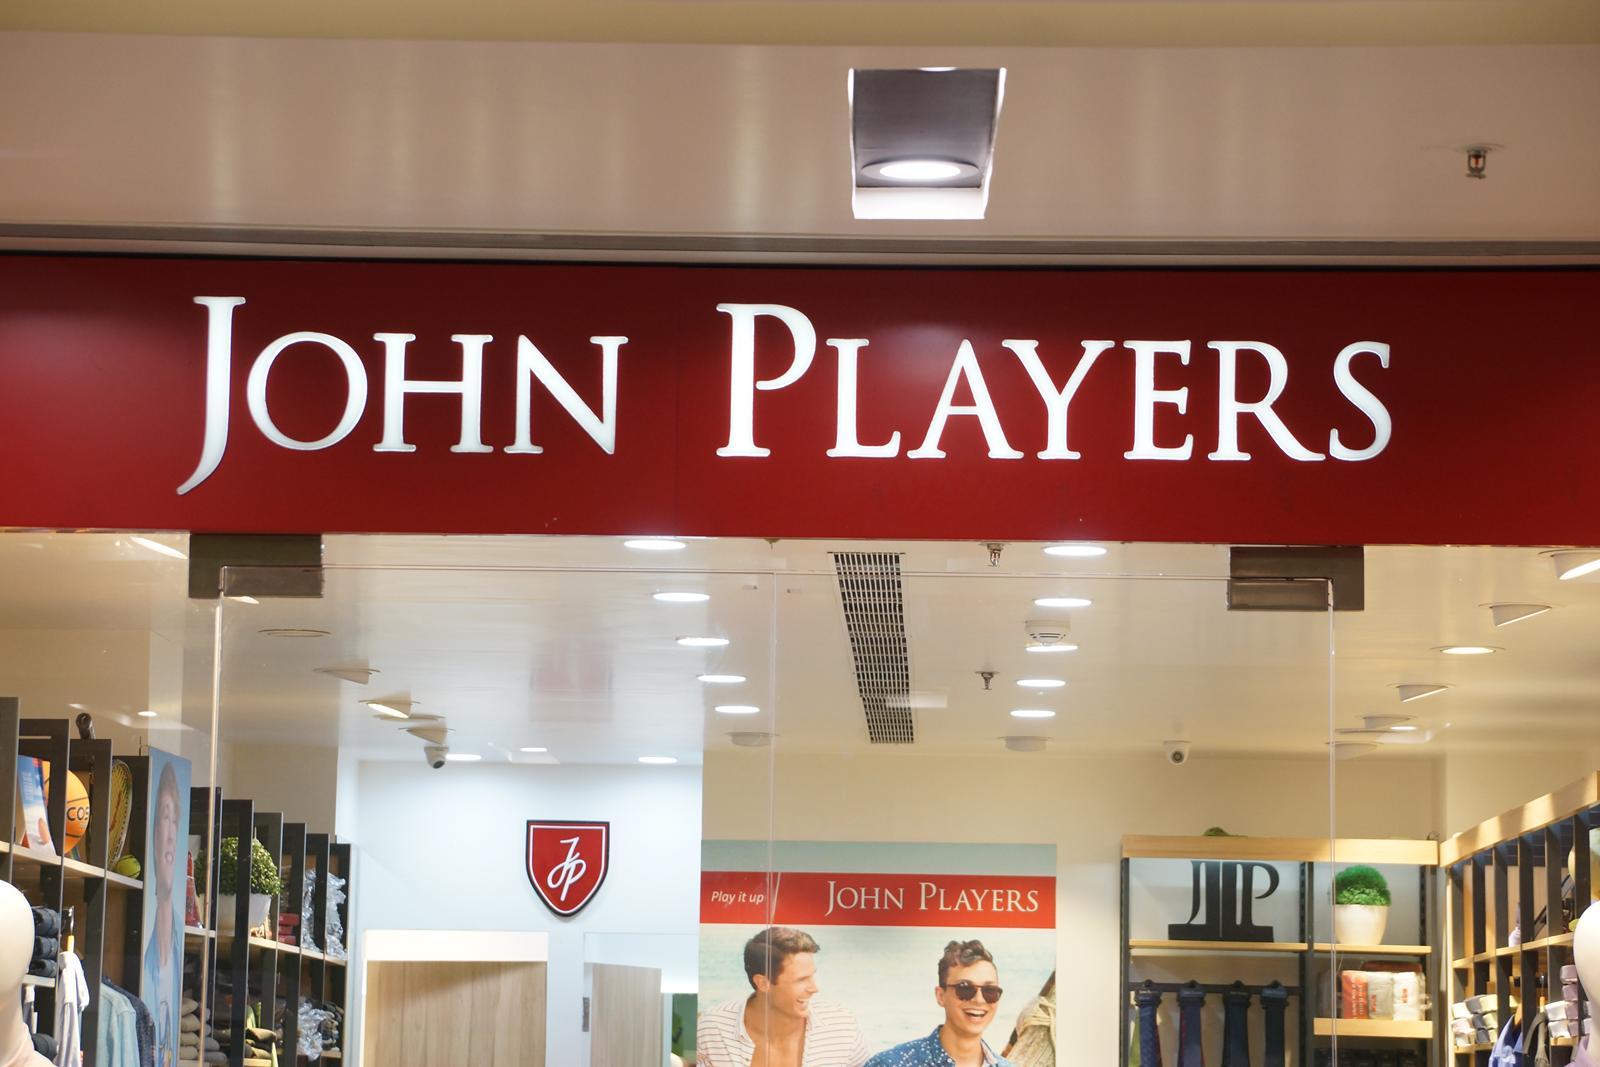 ITC sells brand John Players to Reliance Retail